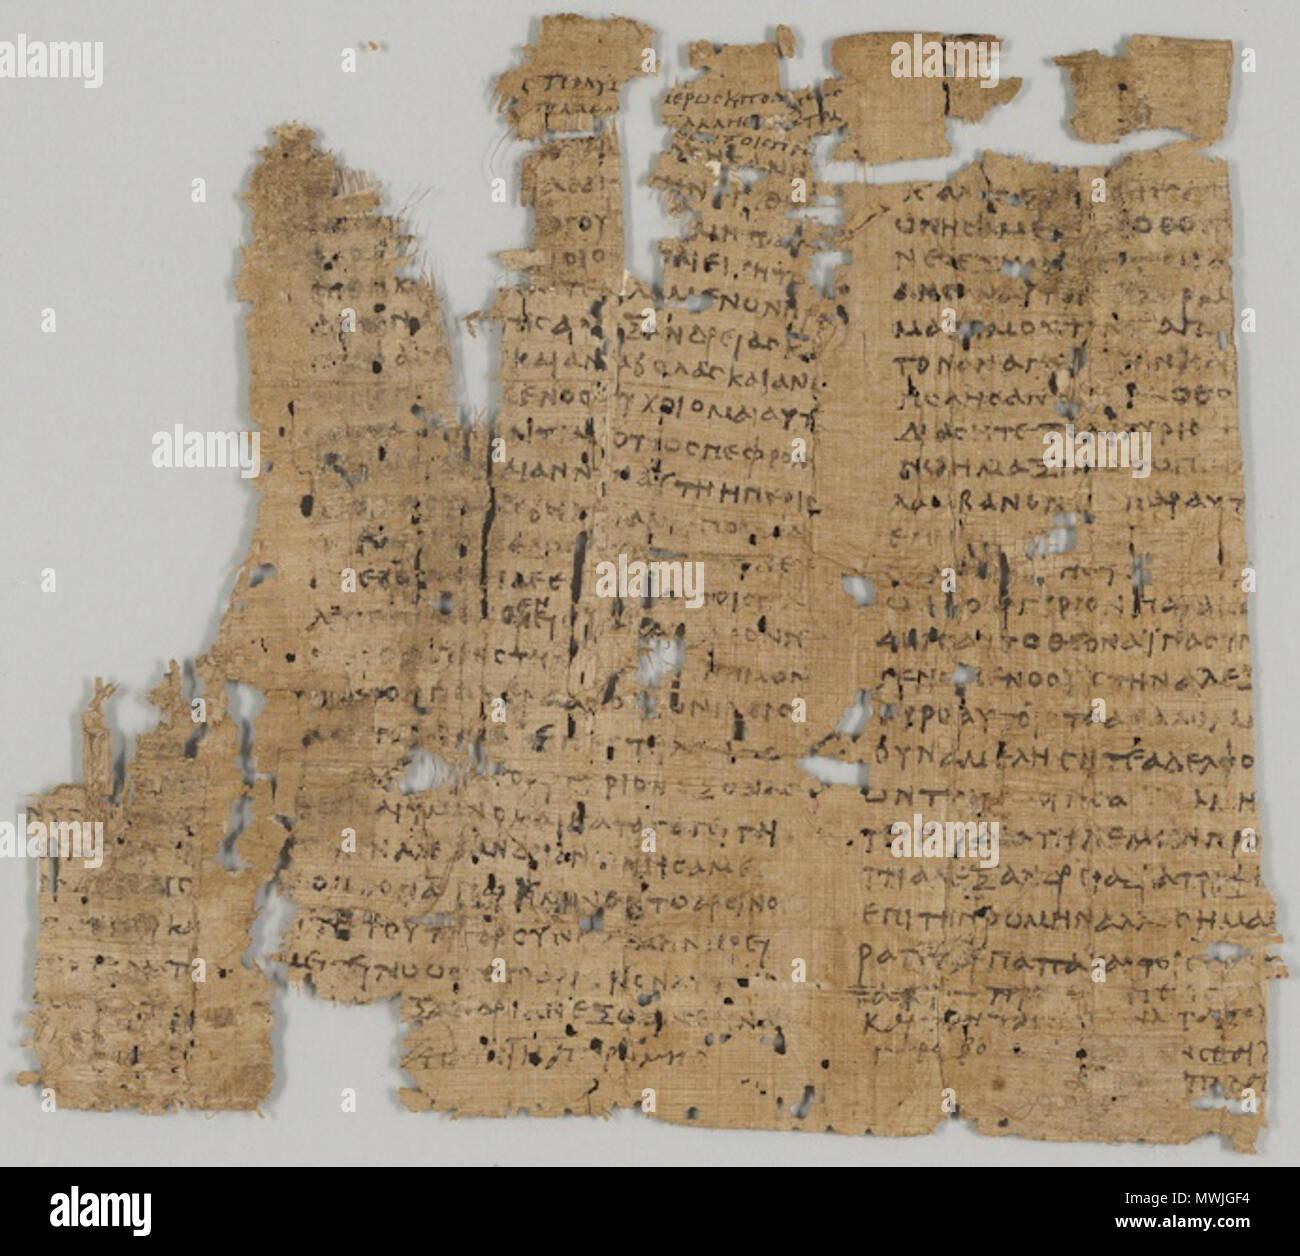 Englisch Papyrus Amherst 3a 3b Morgan Library Pap Gr 3